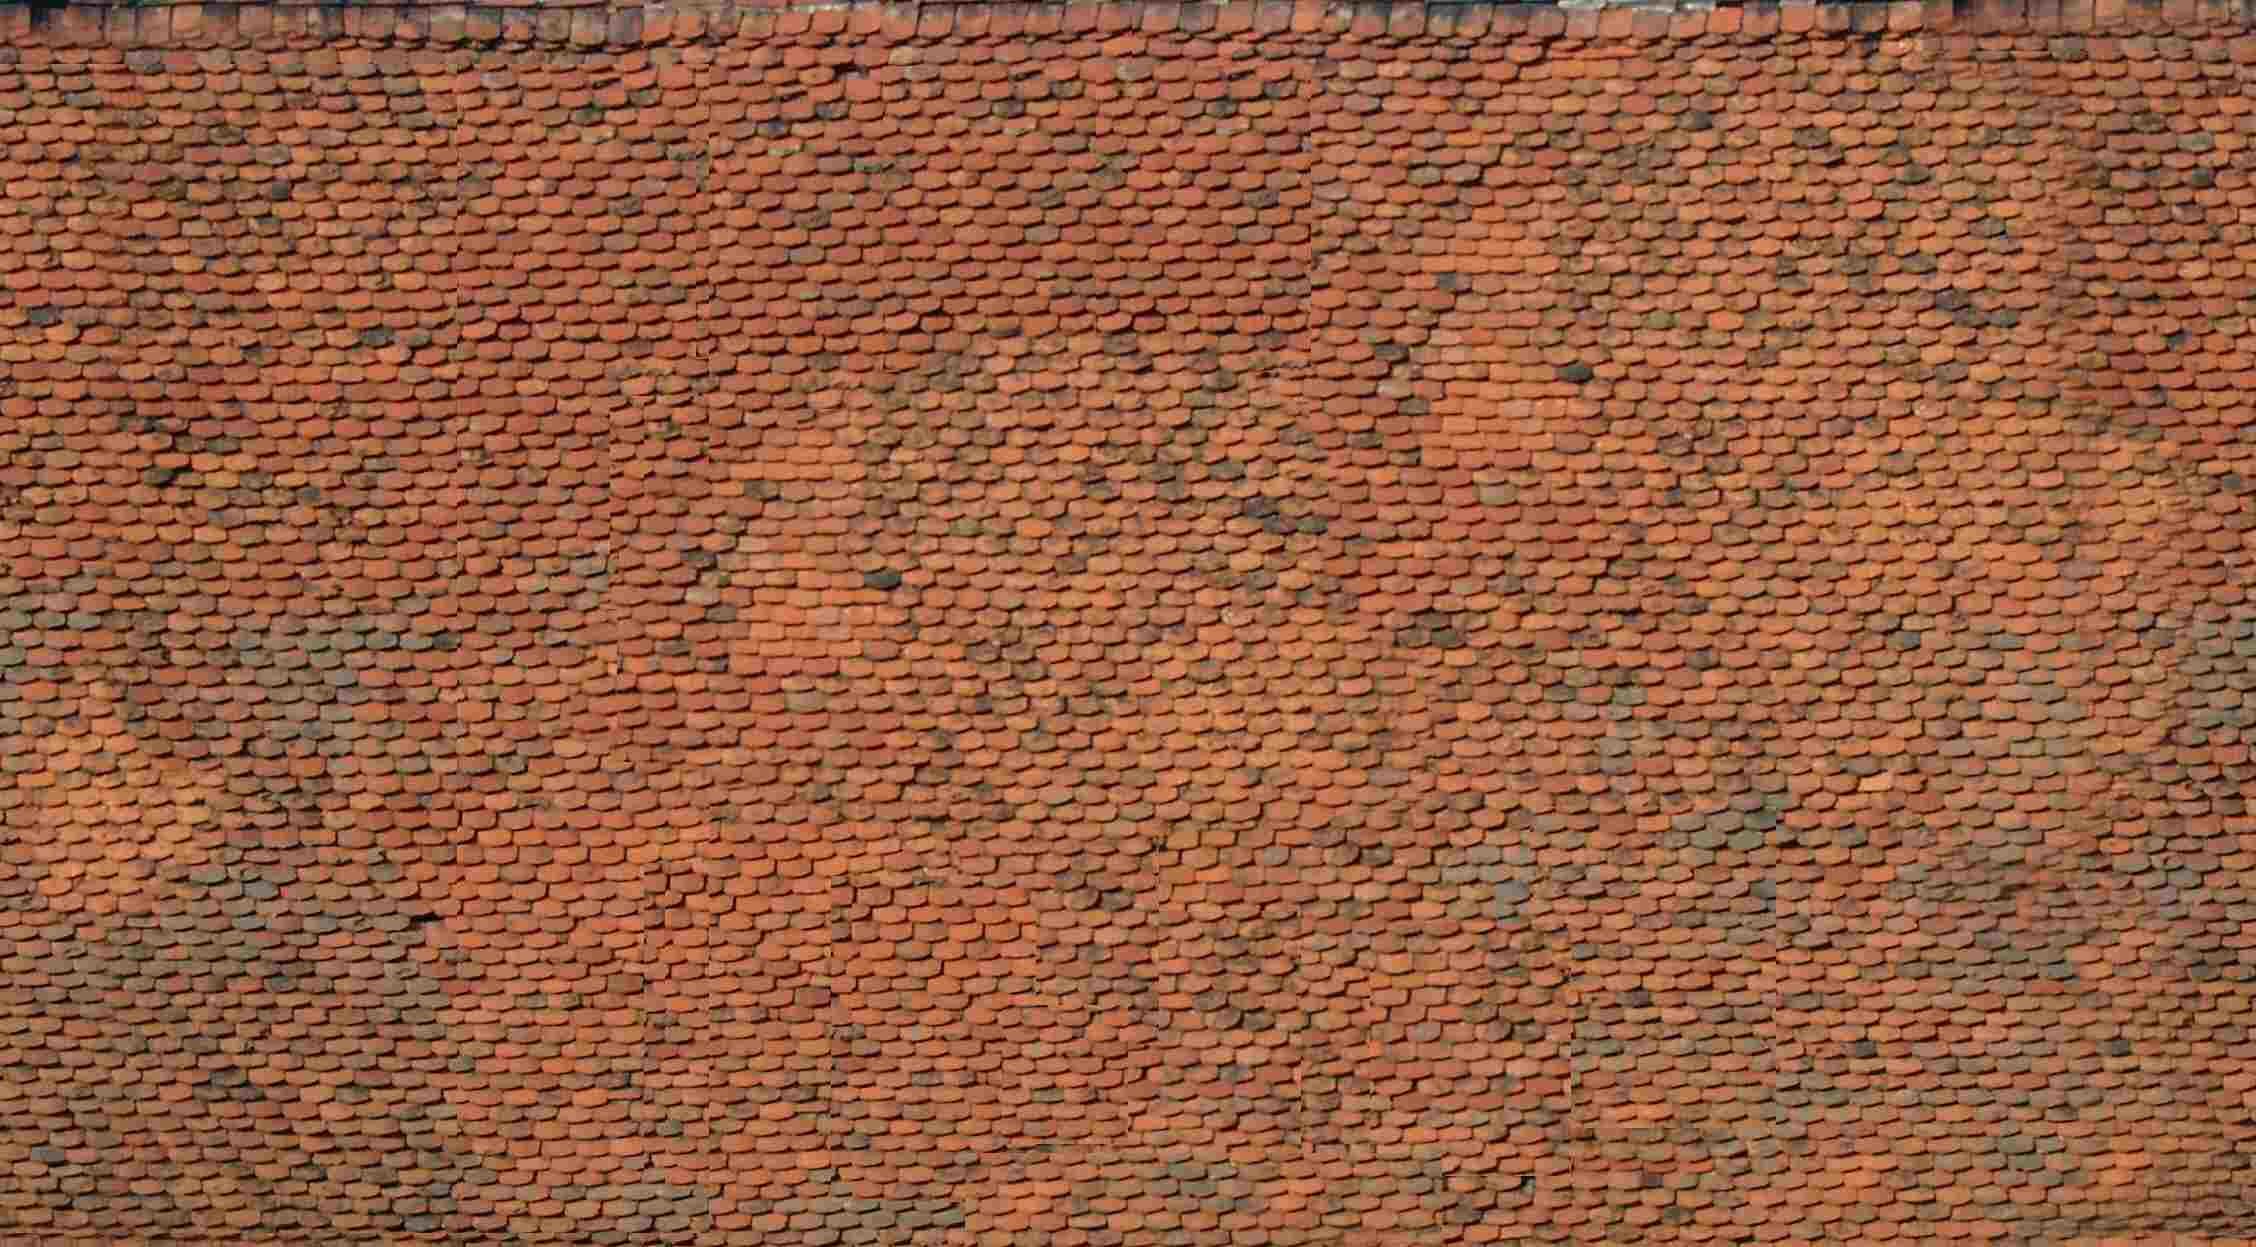 Dach textur  Index of /Texturen/gebaeude/Dach